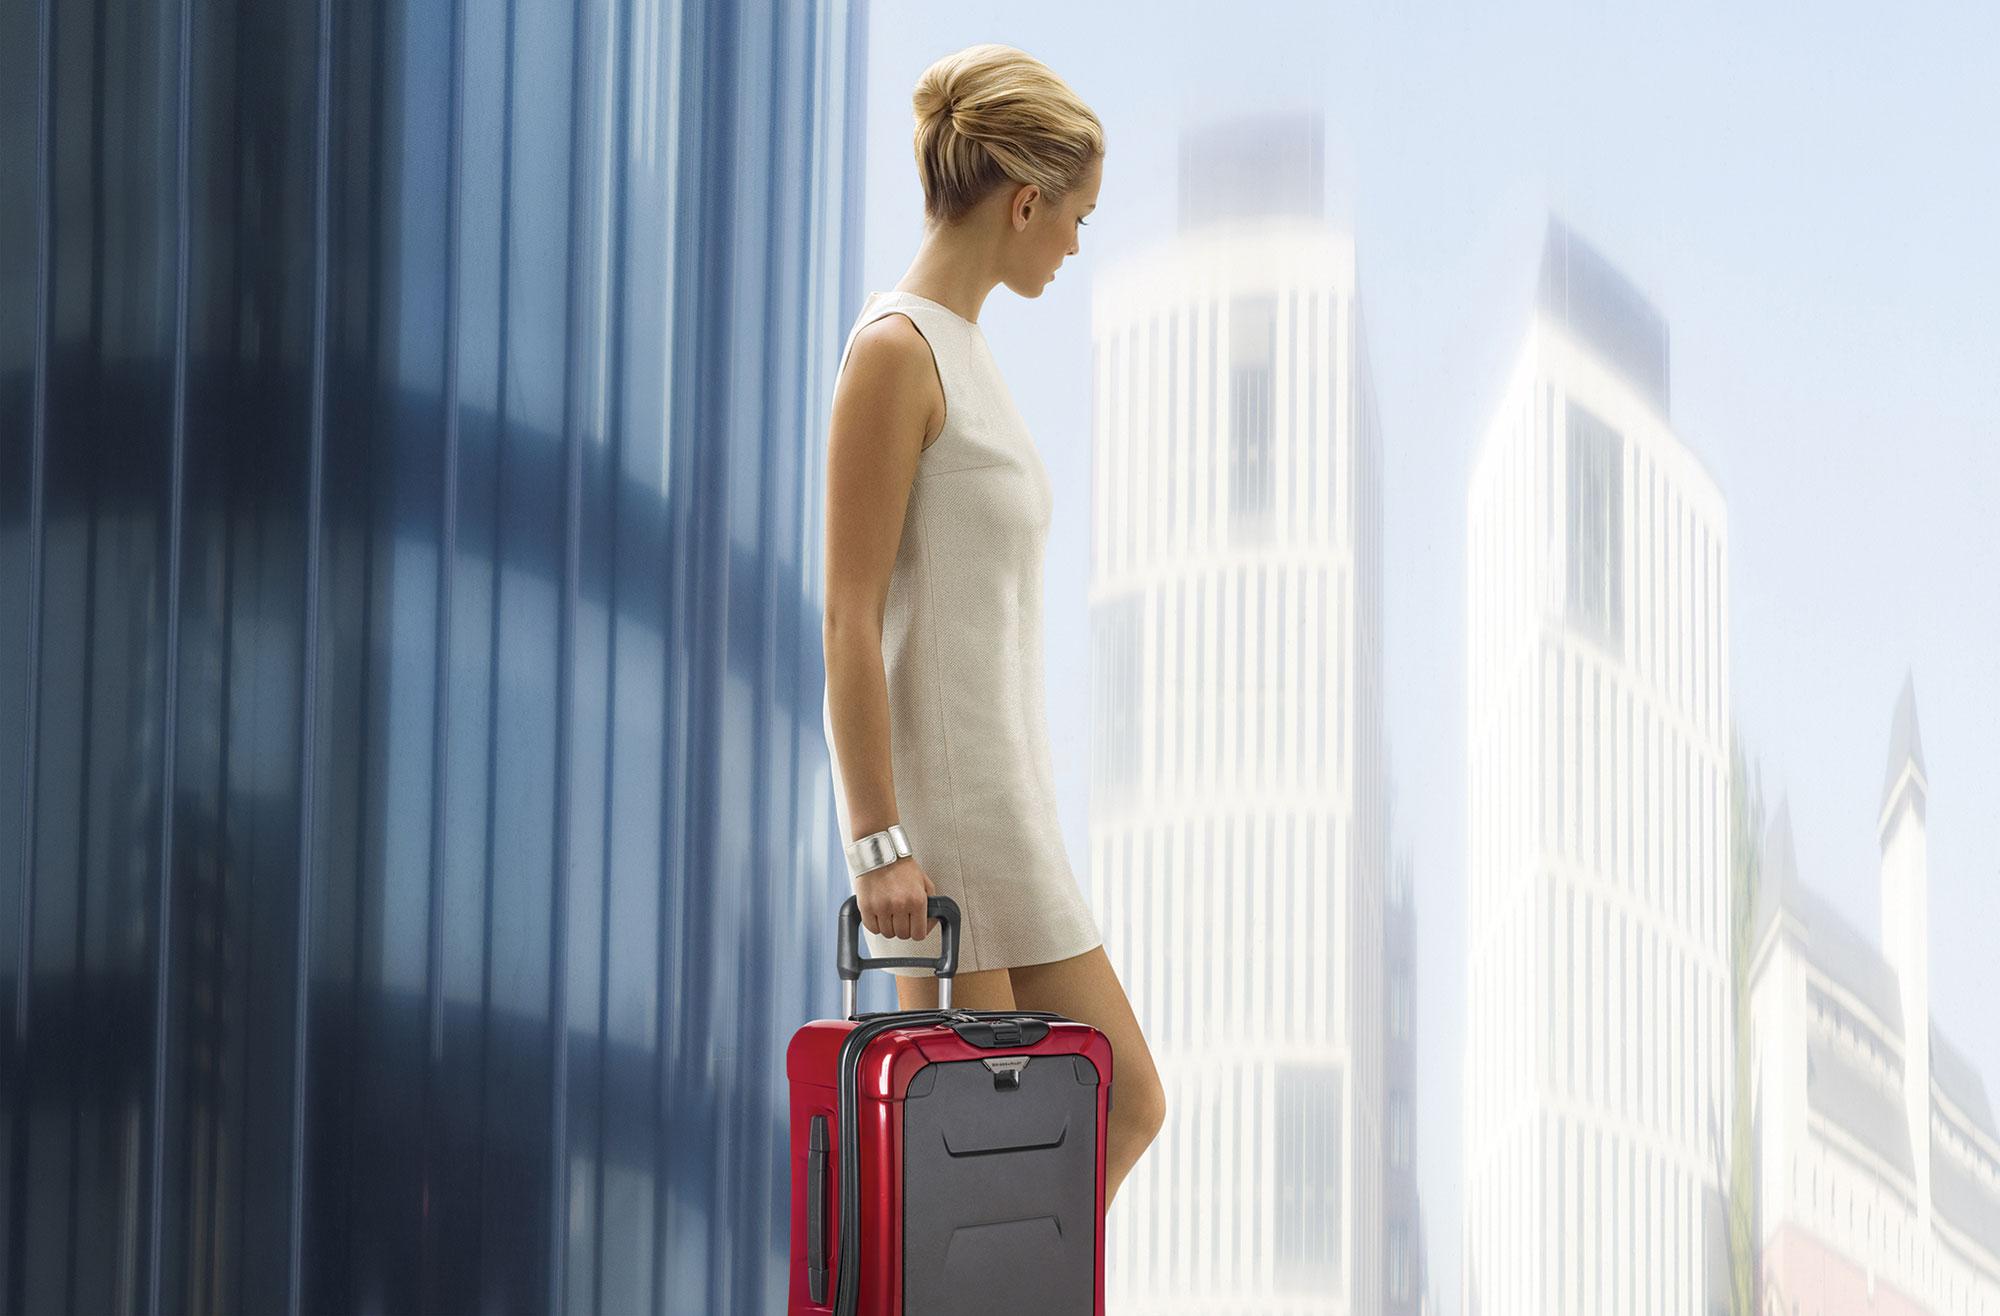 GirlCover_holding_torq_luggage1.jpg